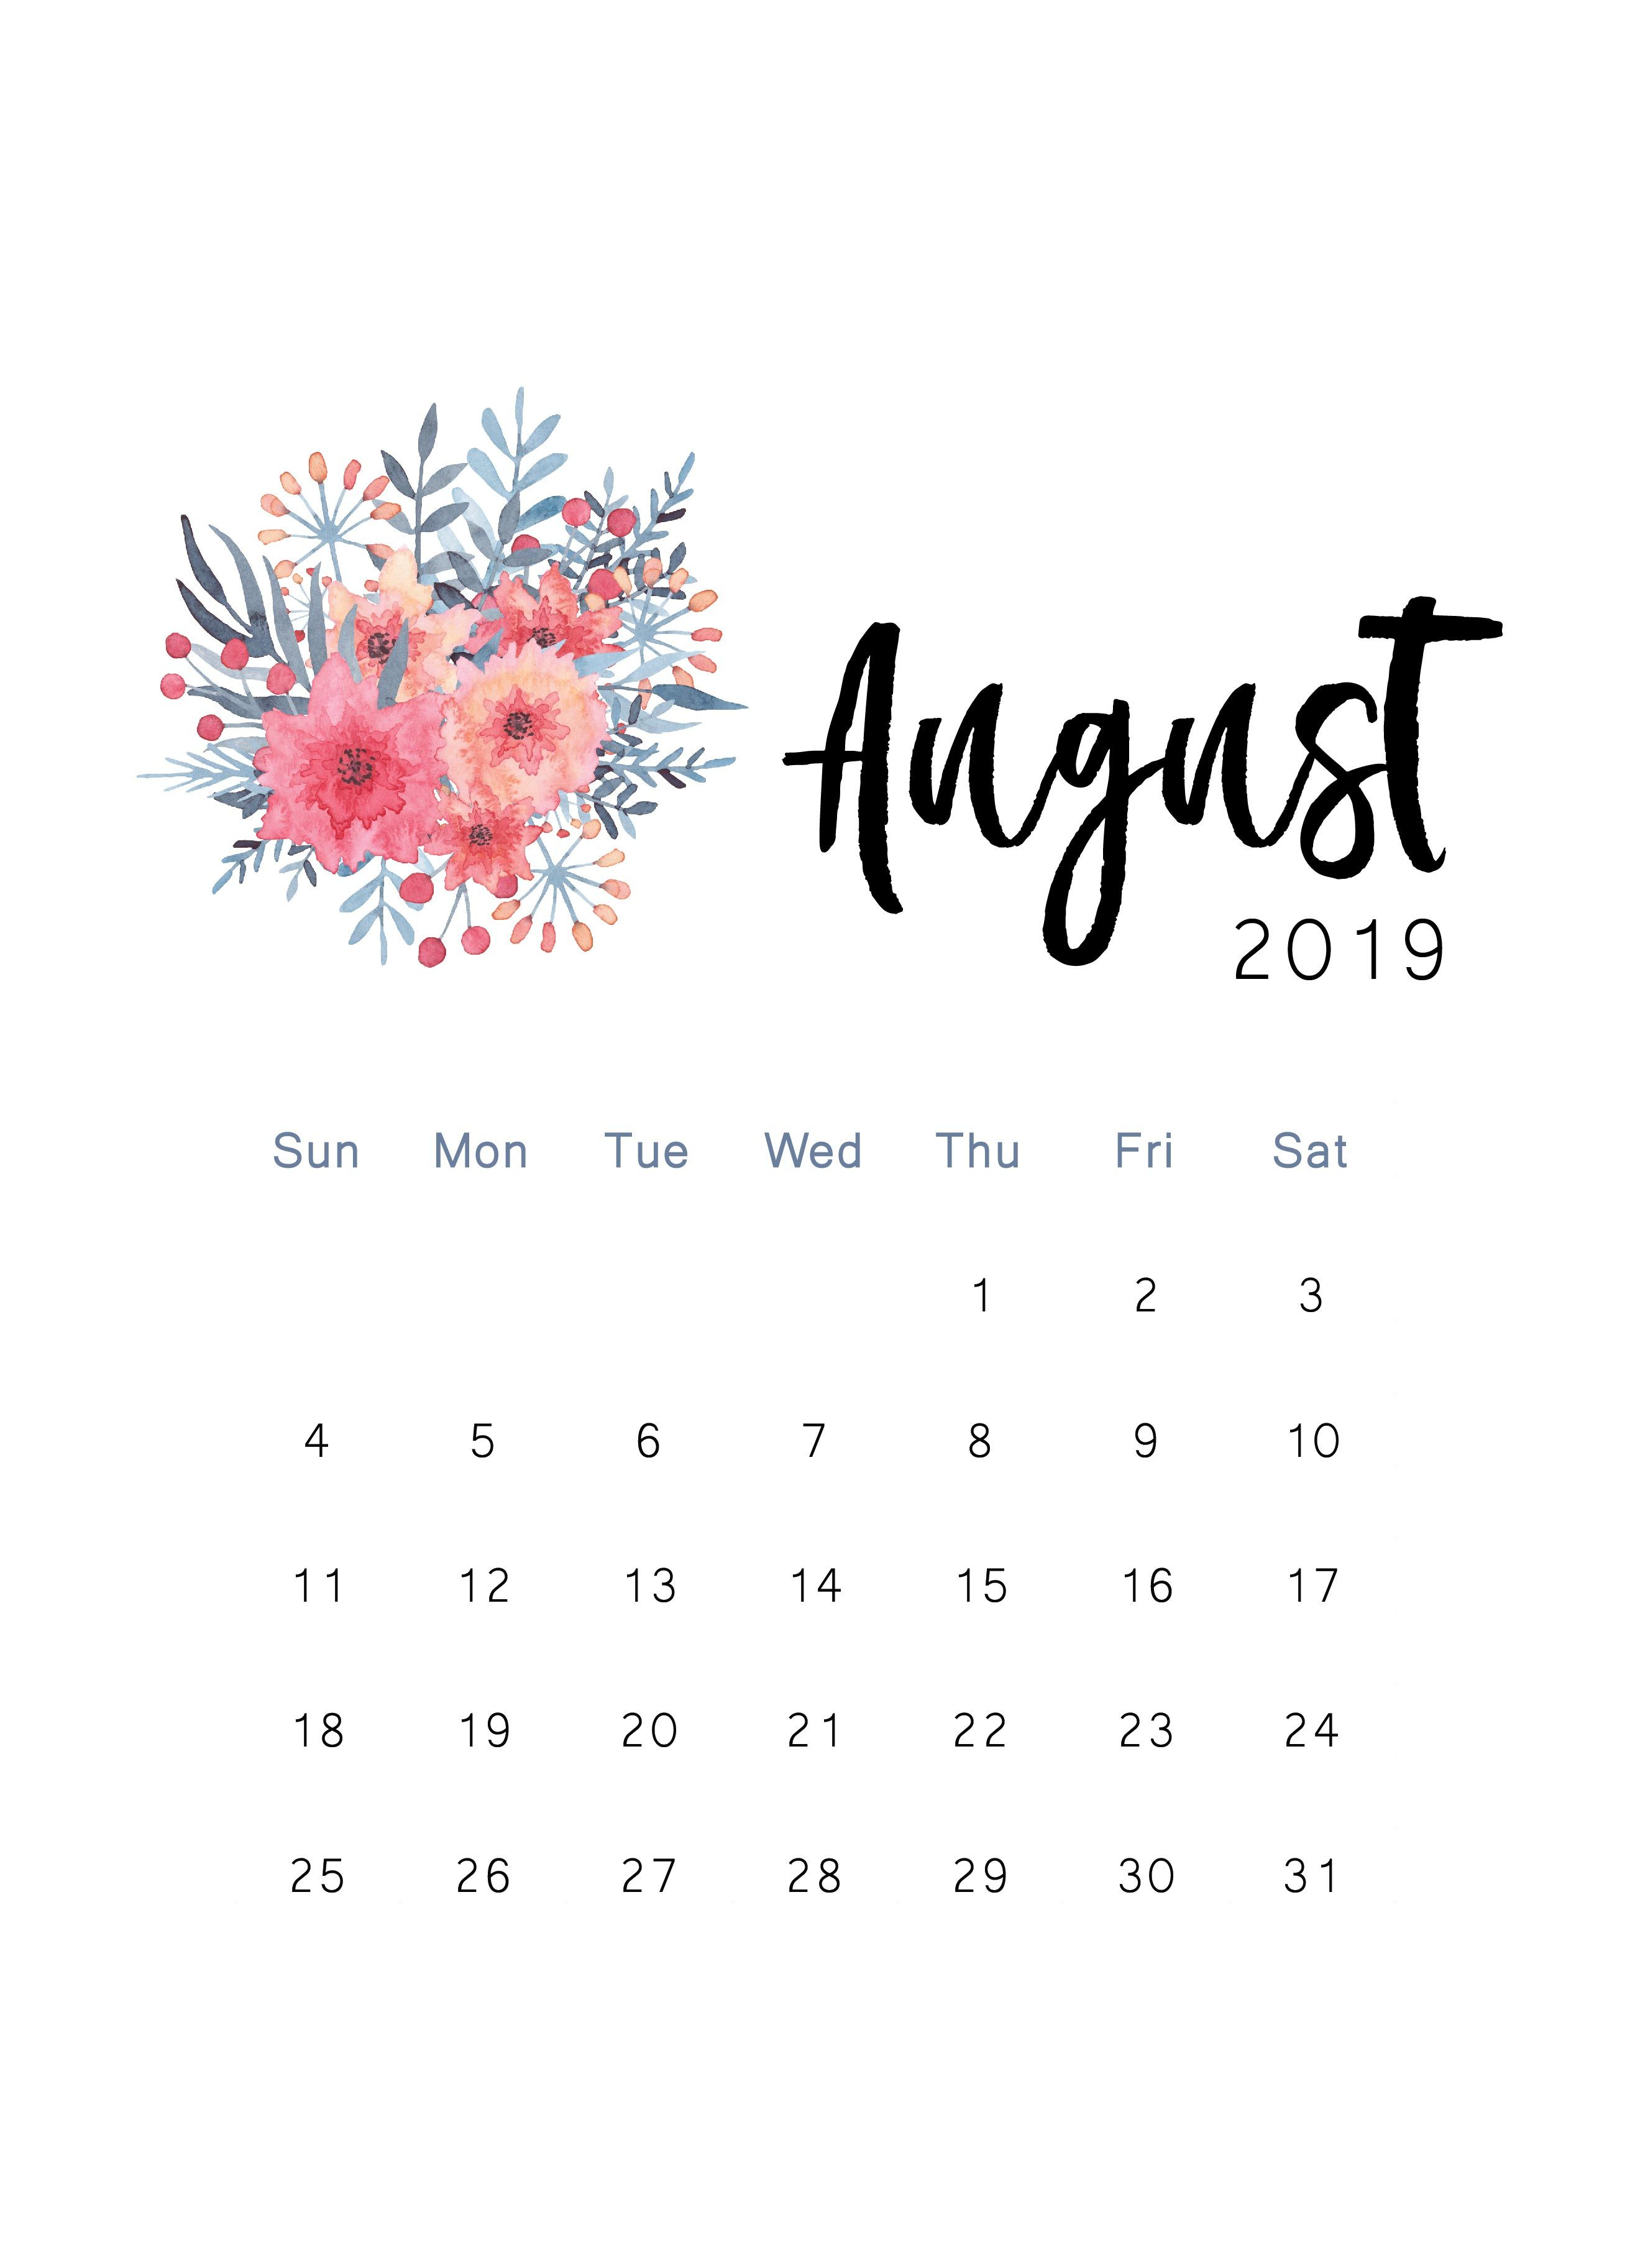 Cute August Calendar 2019 Wallpaper in Floral Design   Printable 2623x3649